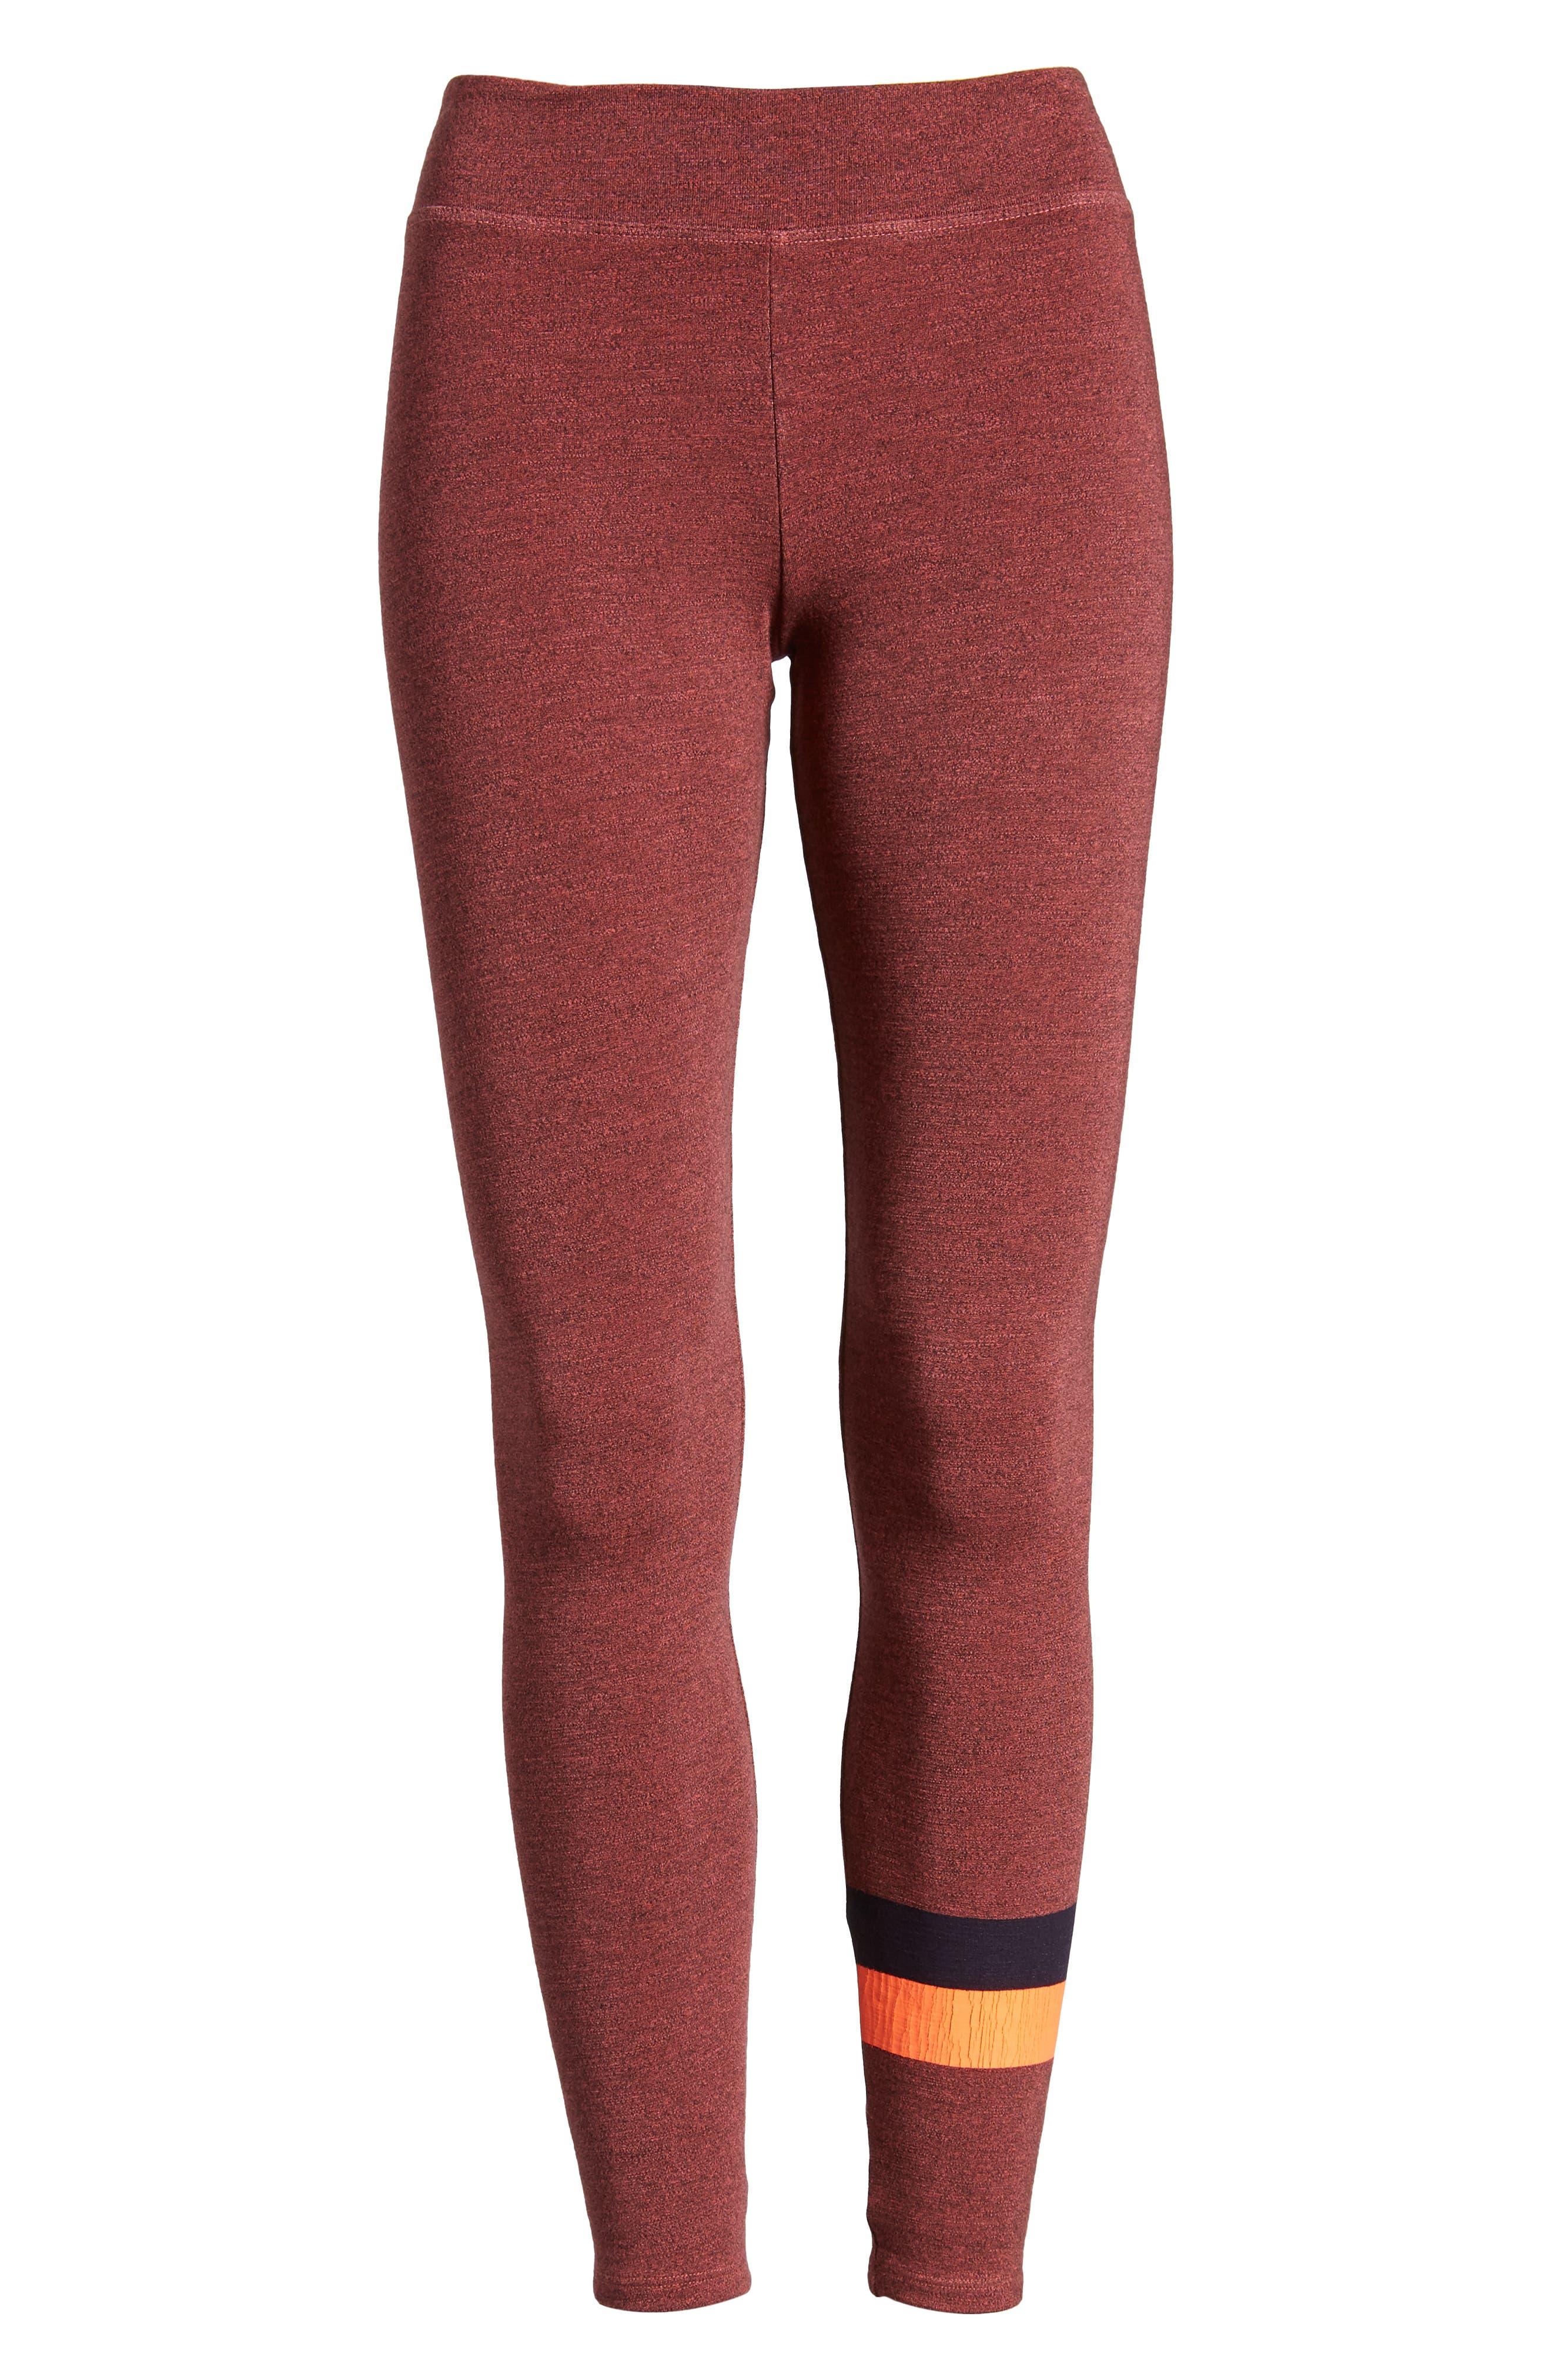 Active Stripe Yoga Pants,                             Alternate thumbnail 6, color,                             651